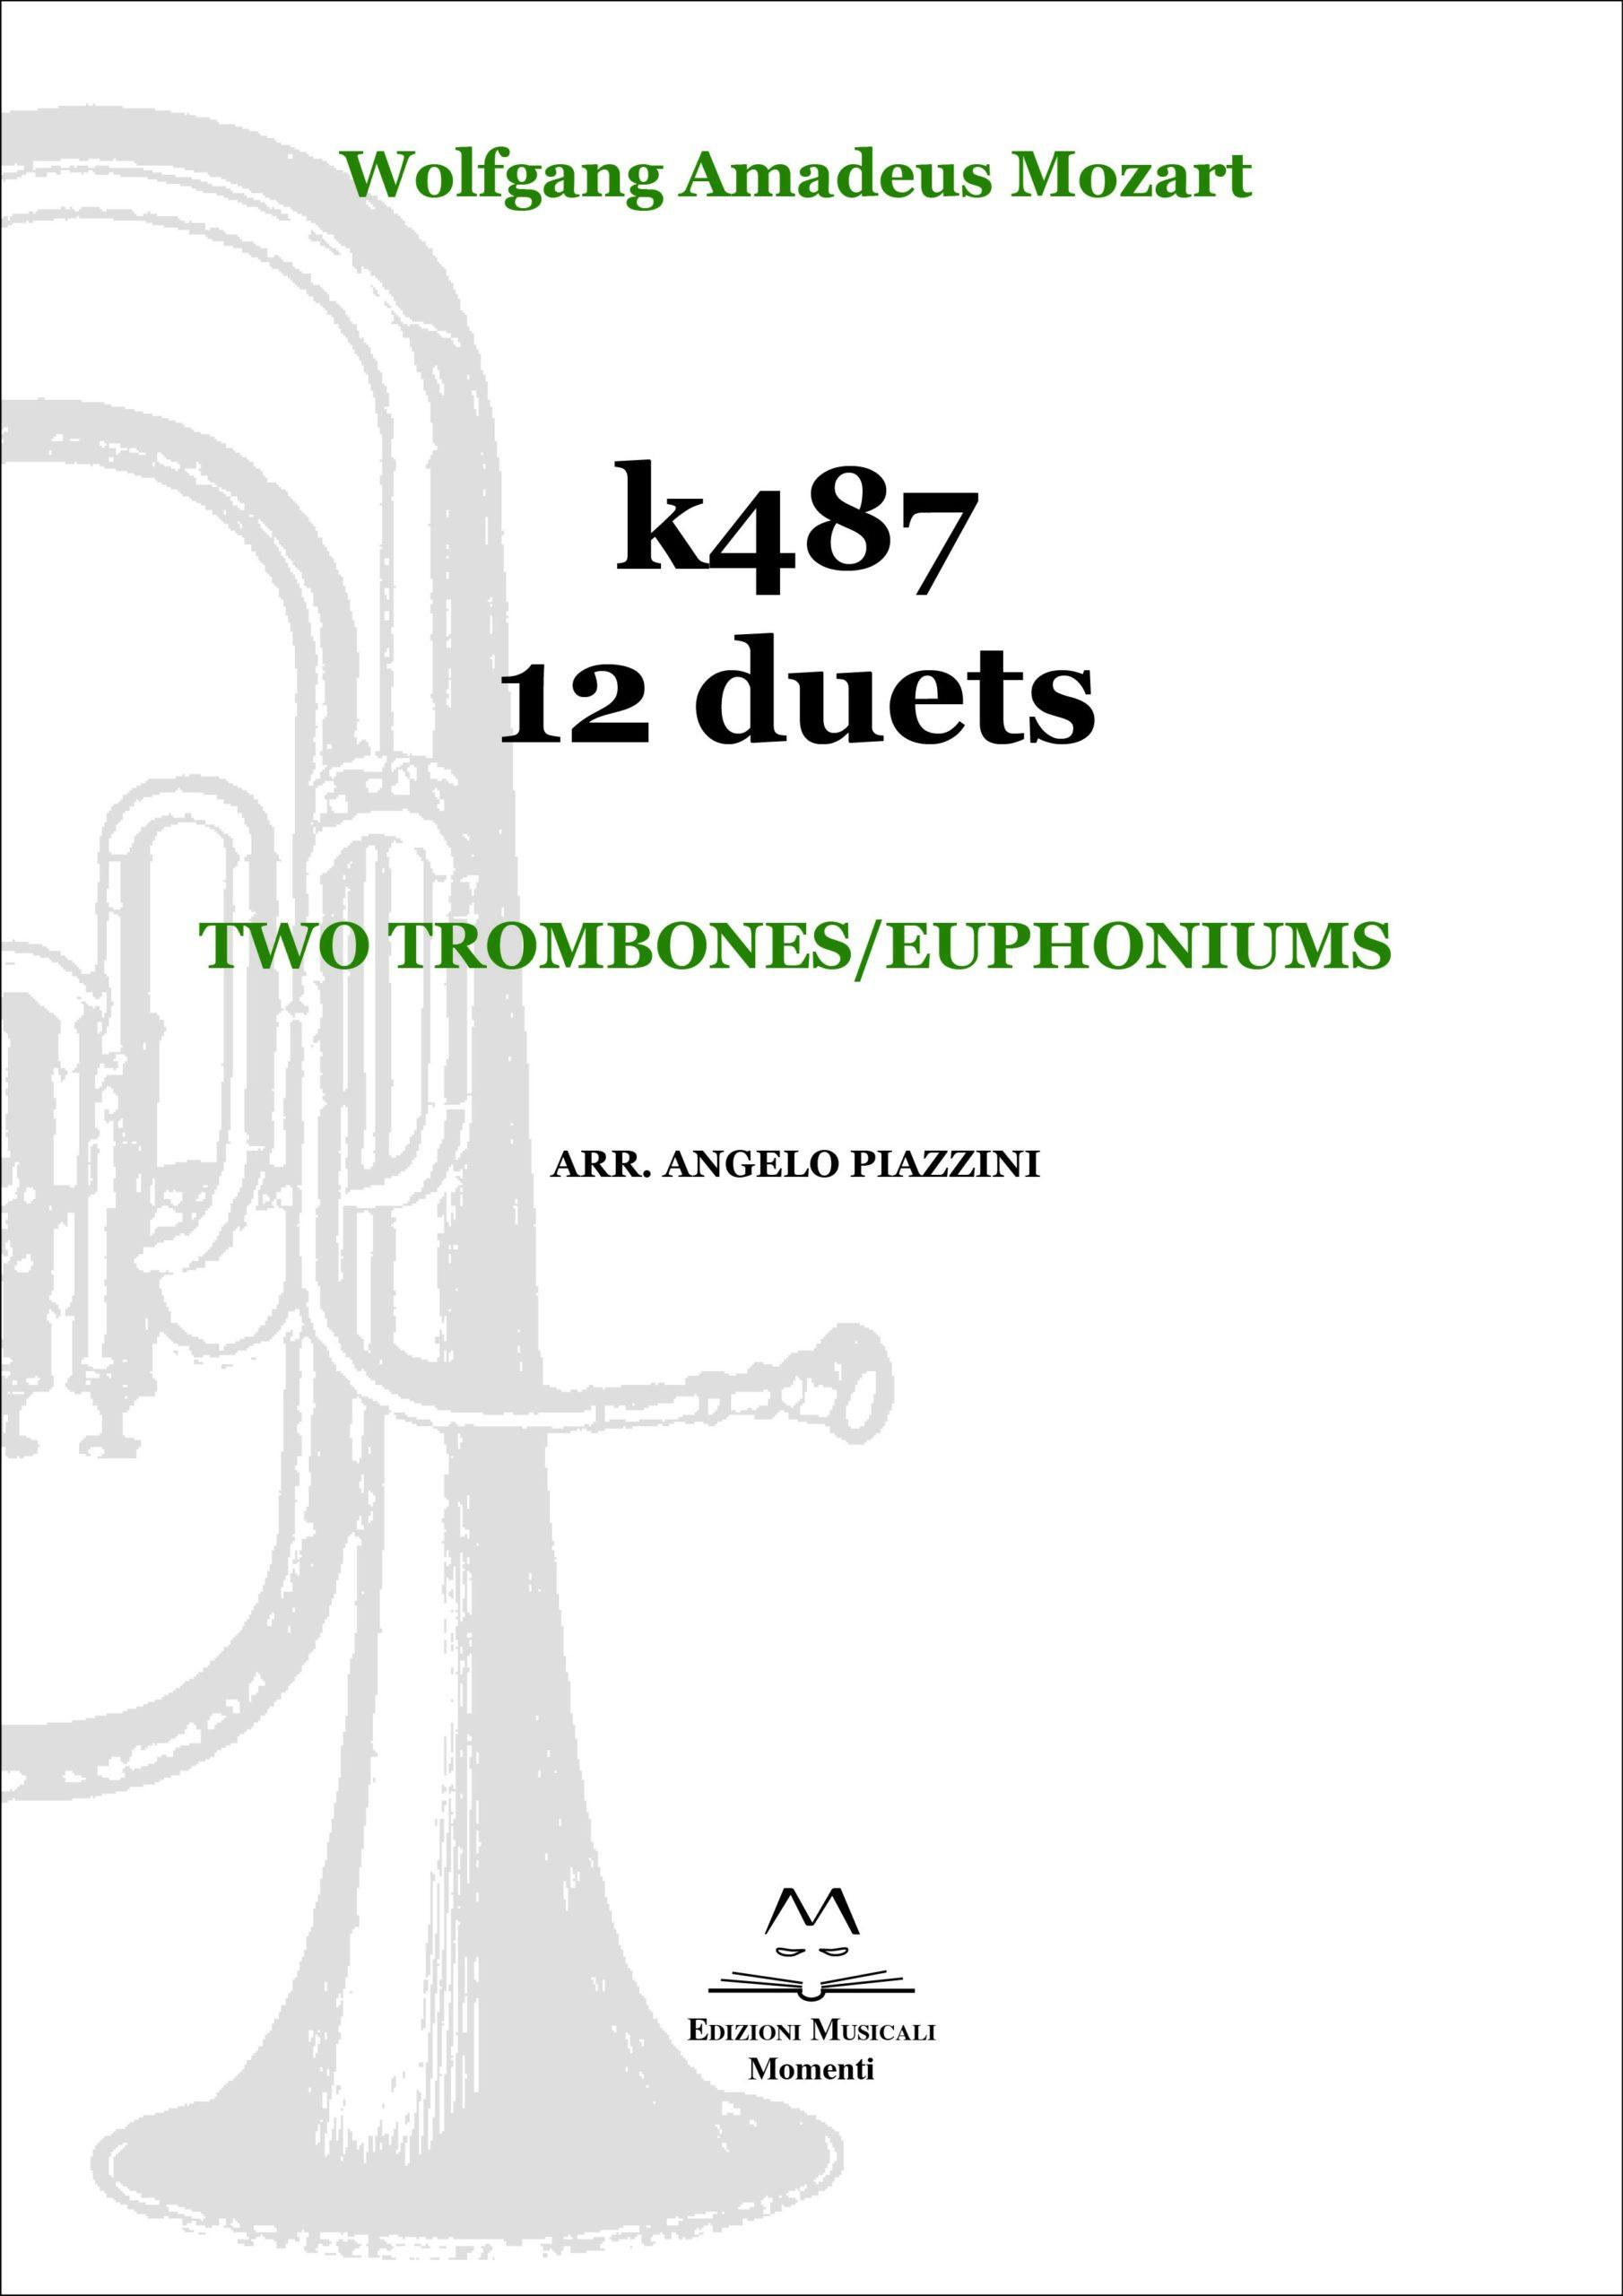 K487 12 duets. Two trombones/euphoniums arr. Angelo Piazzini